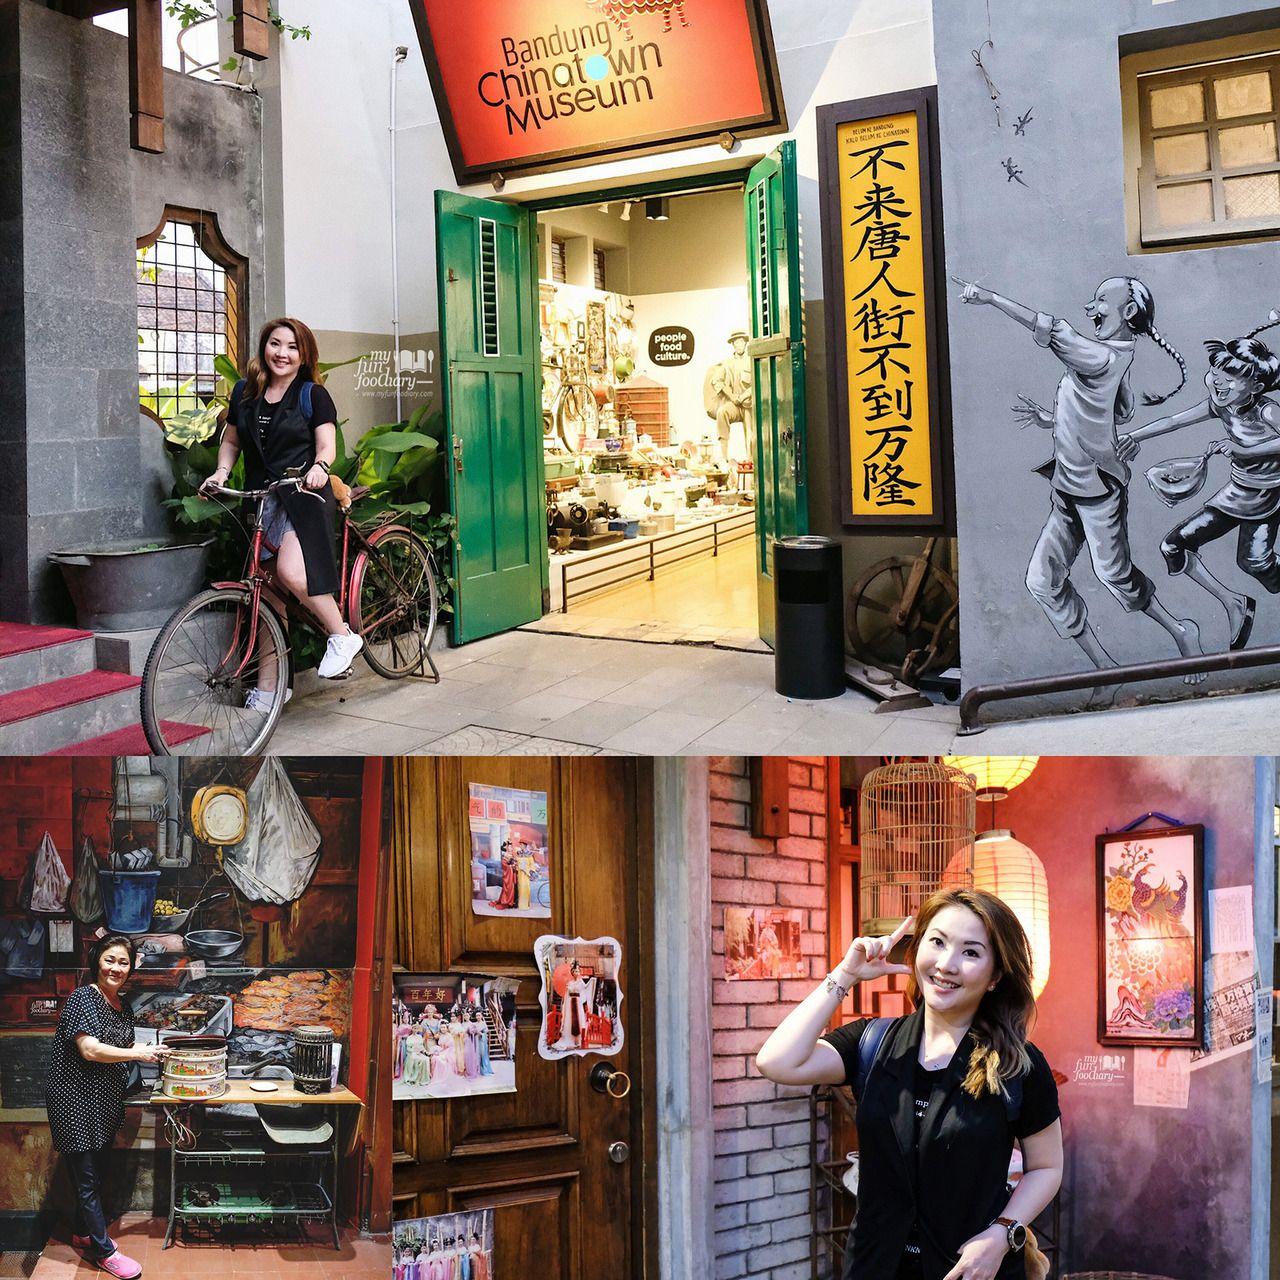 New Chinatown Bandung Museum Wisata Pecinan Bandung